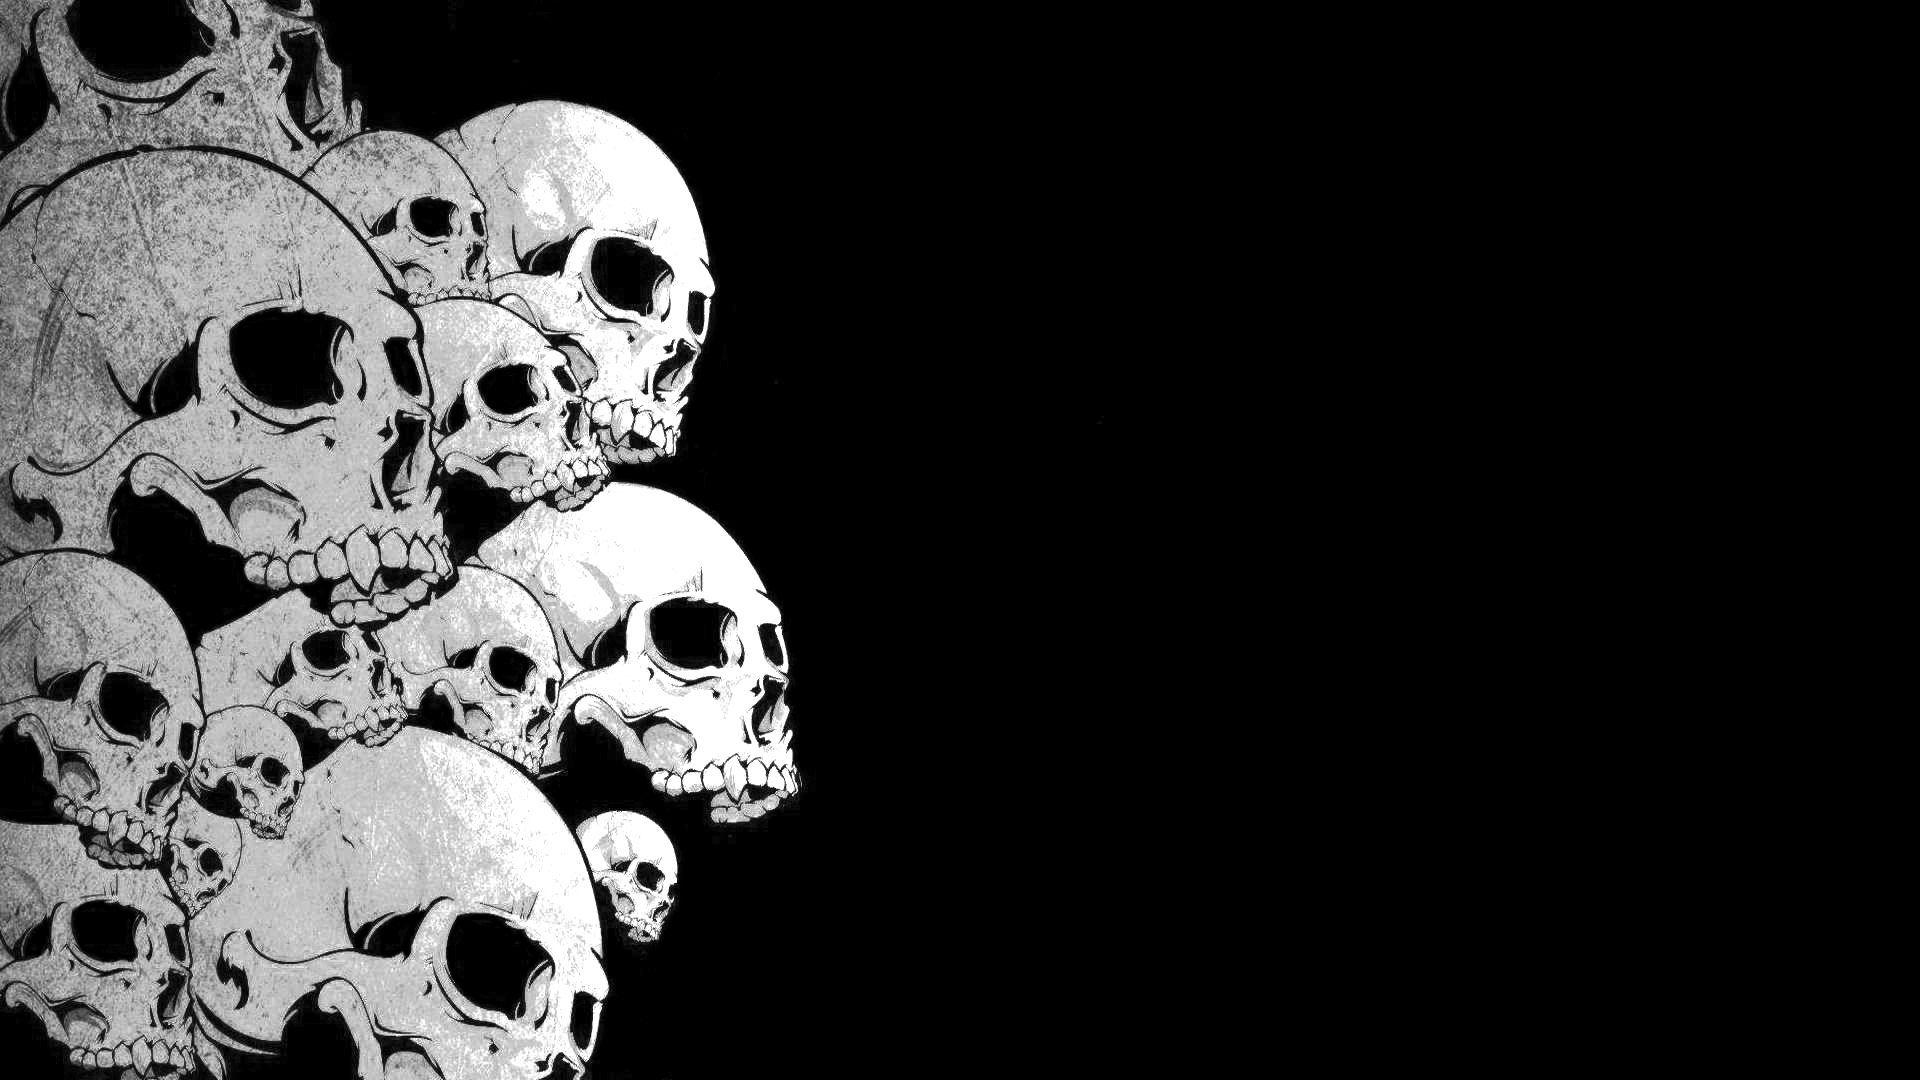 Skull Wallpapers - Wallpaper Cave